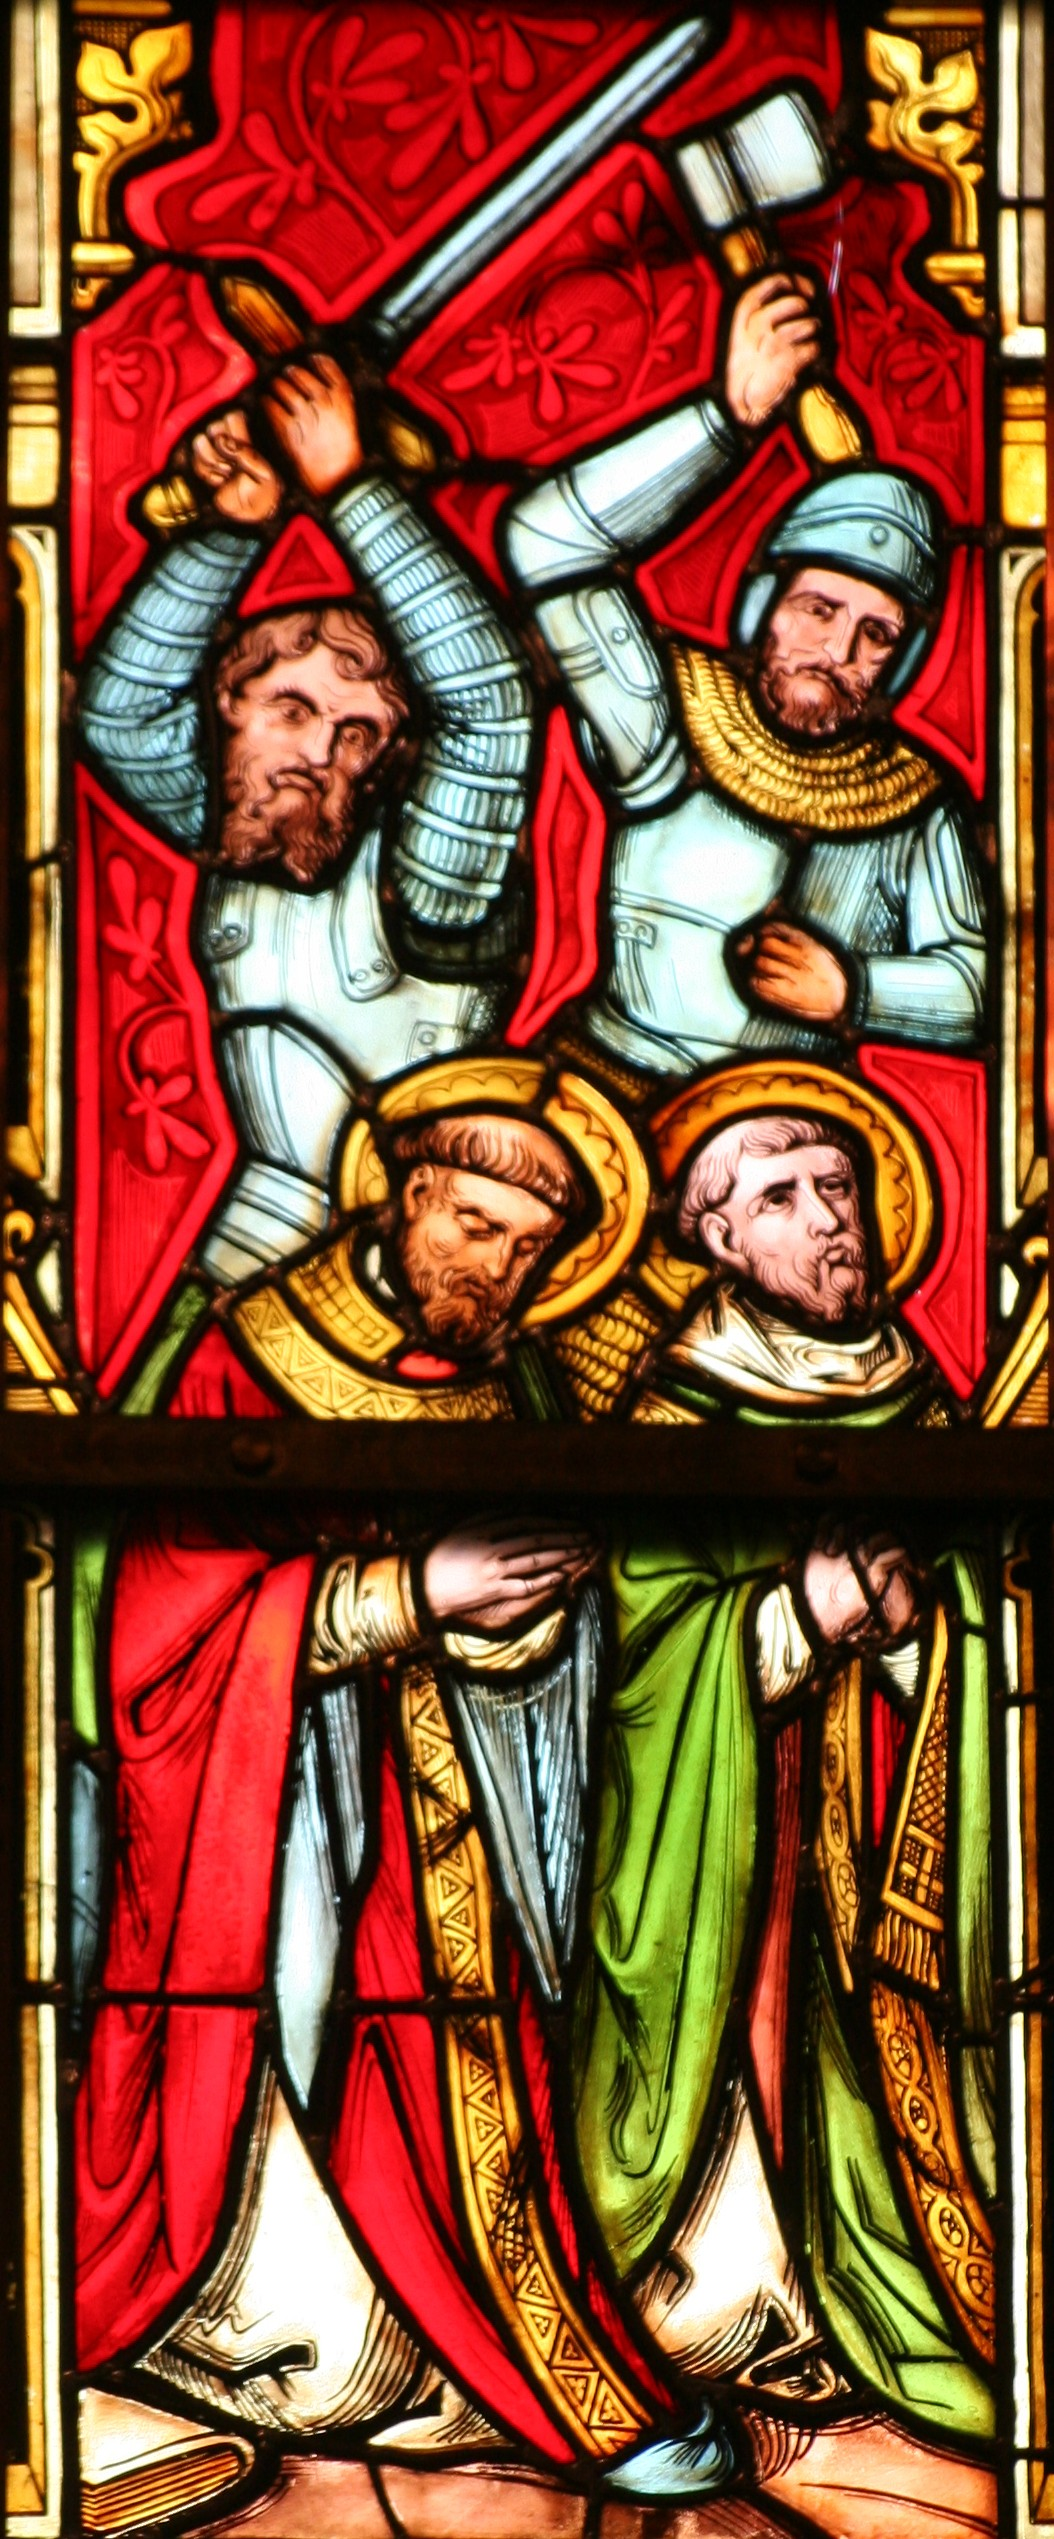 Martydom of Saints Ewald the Fair and Ewald the Black